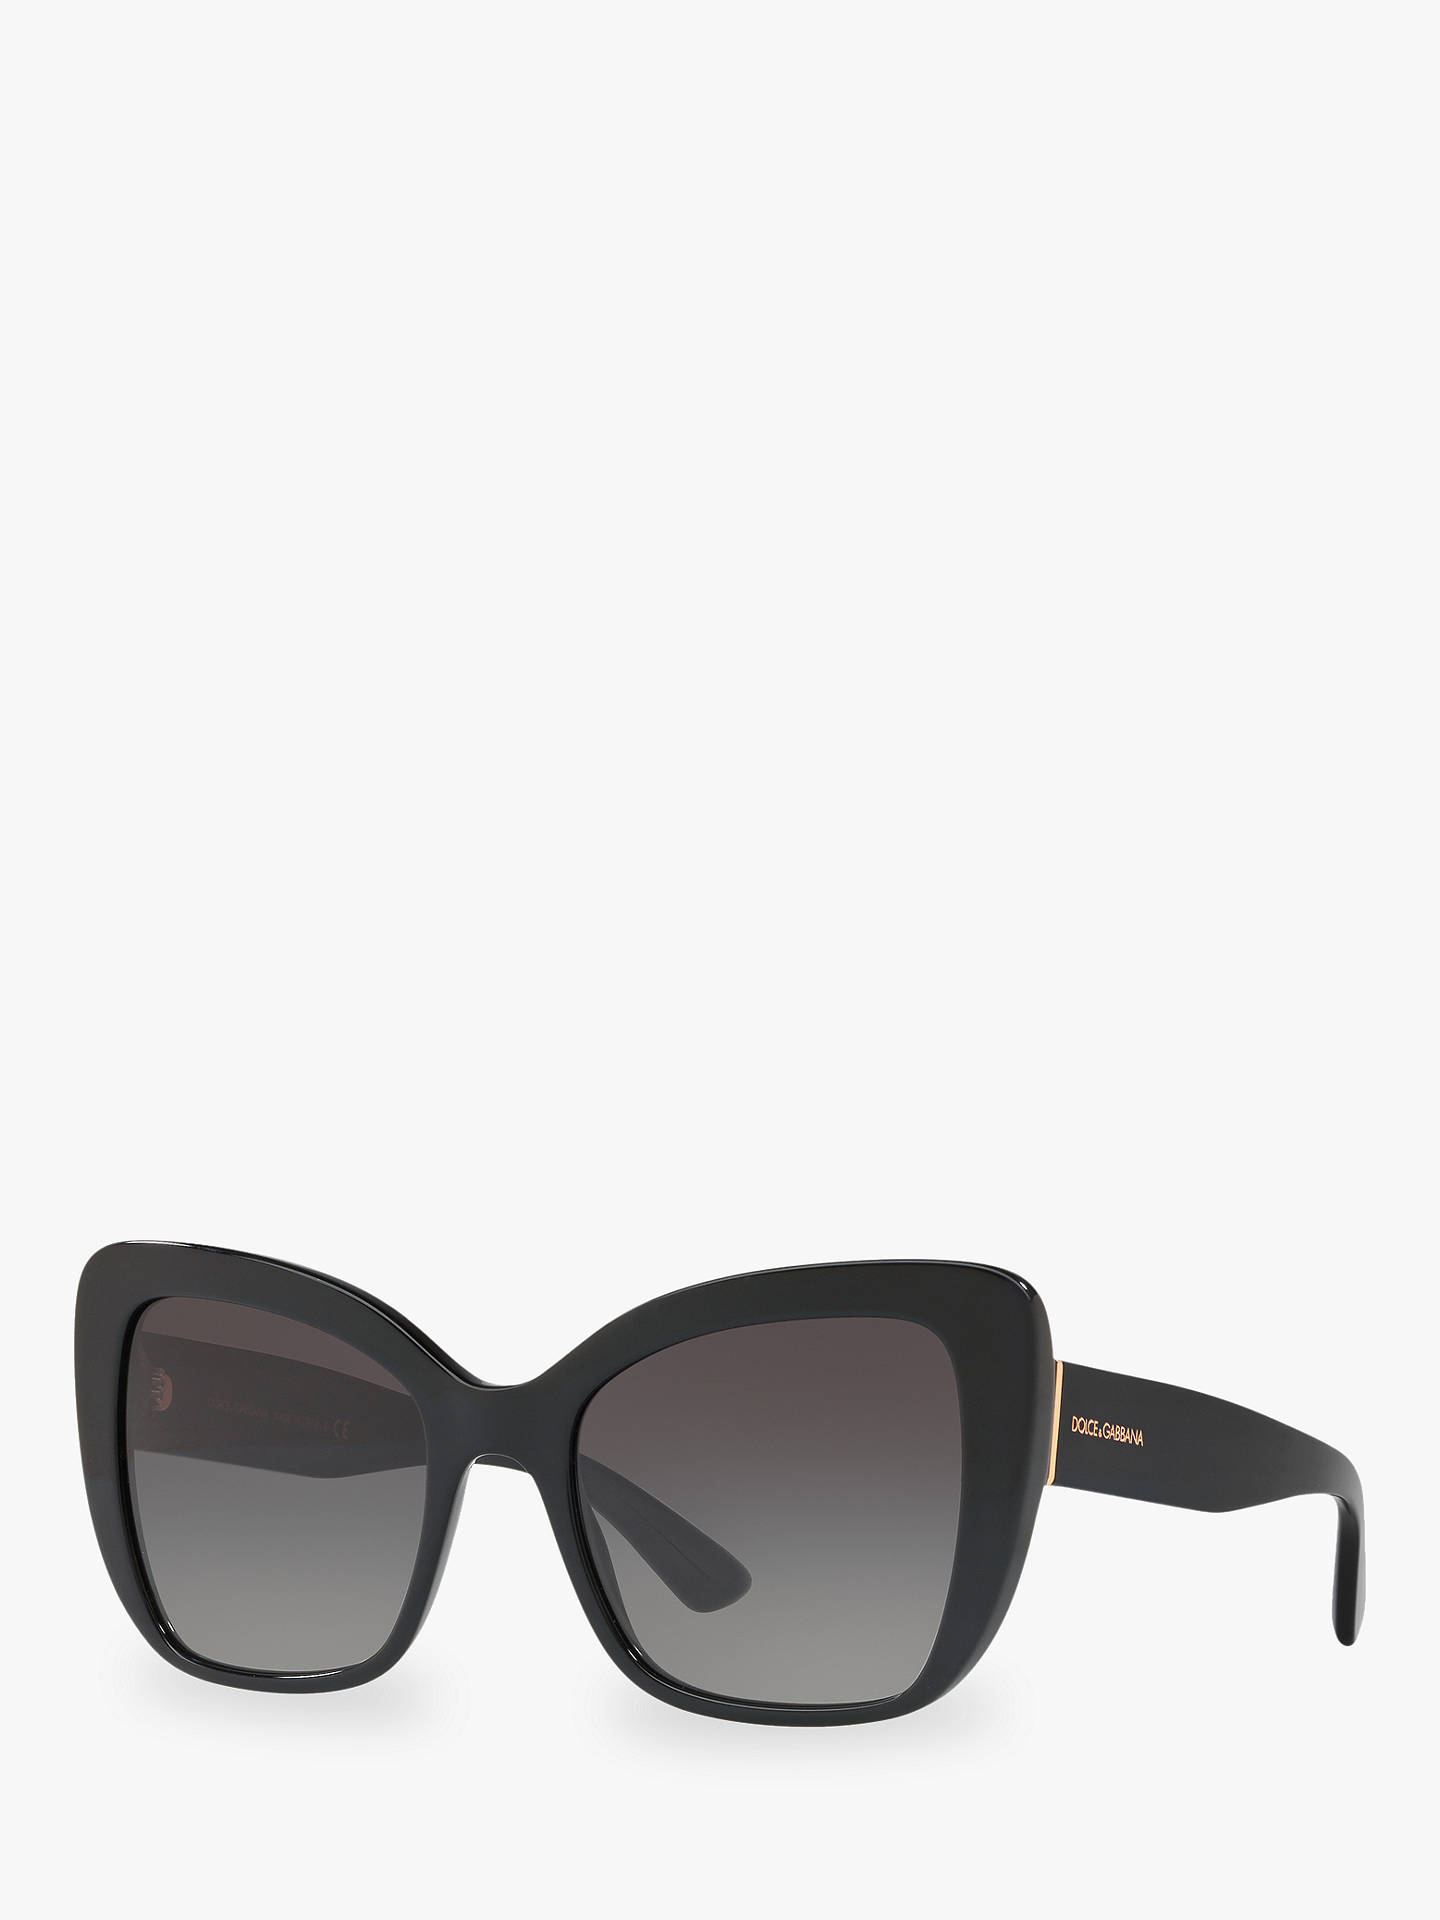 0250fb1c8 Buy Dolce & Gabbana DG4348 Women's Cat's Eye Sunglasses, Black/Grey  Gradient Online at ...